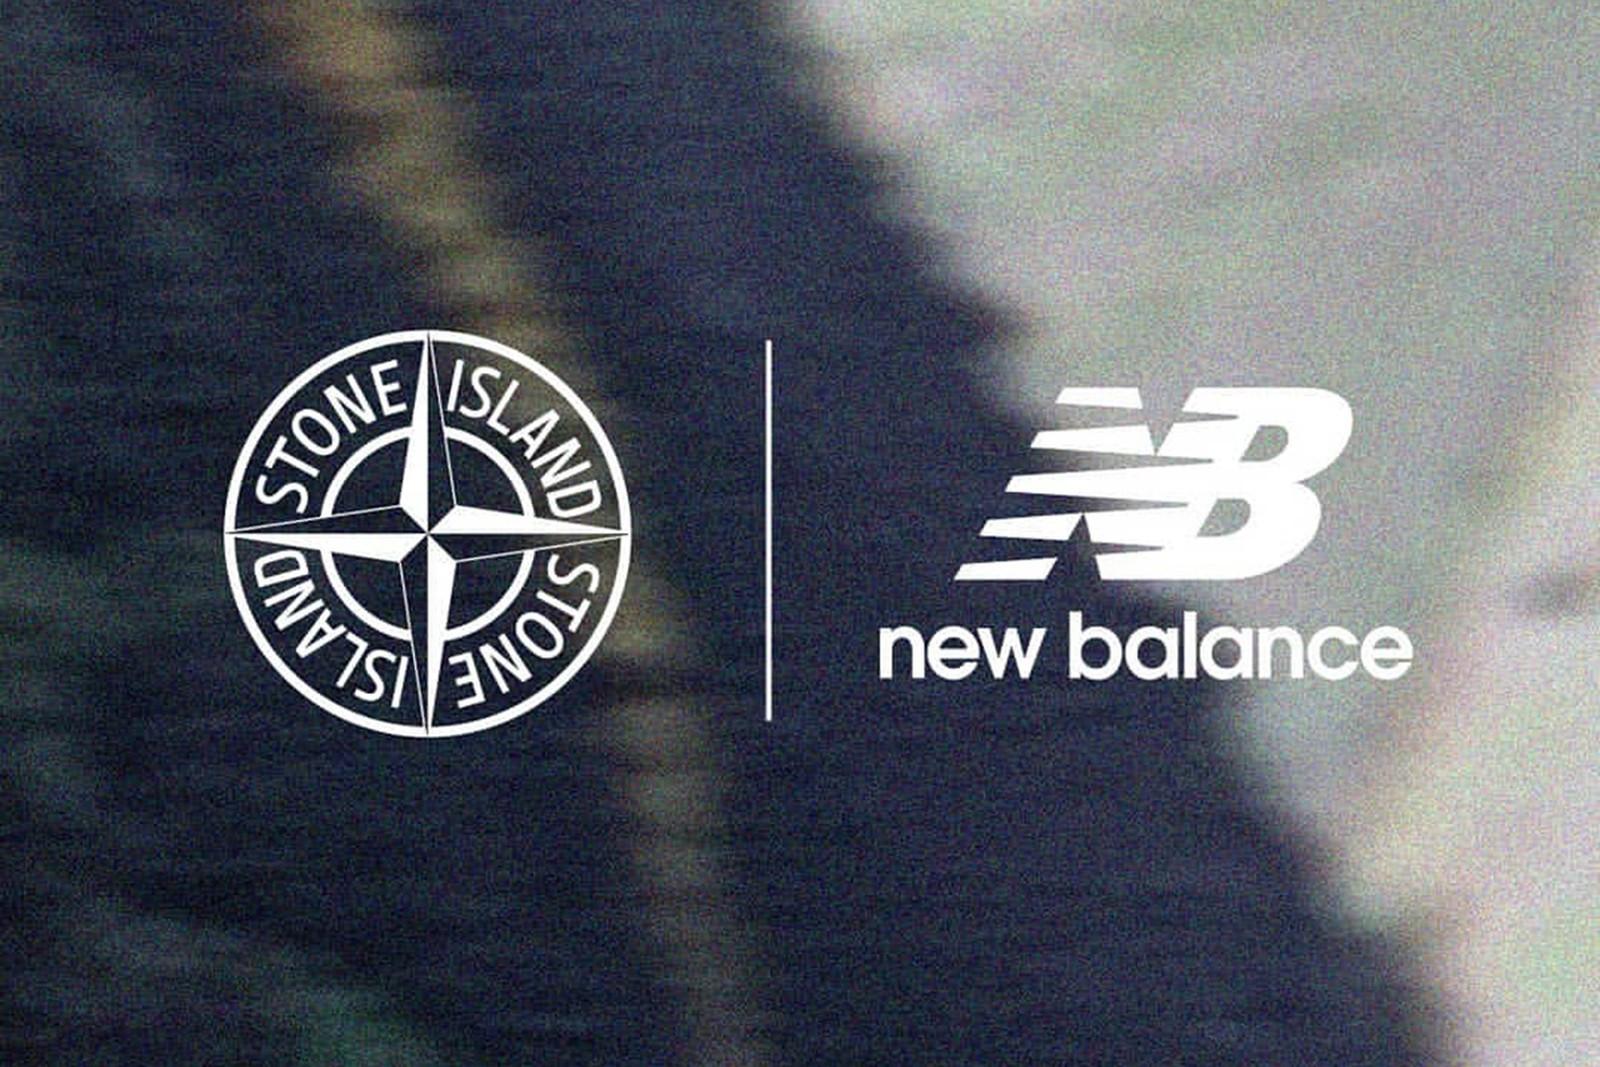 STONE ISLAND and NEW BALANCE